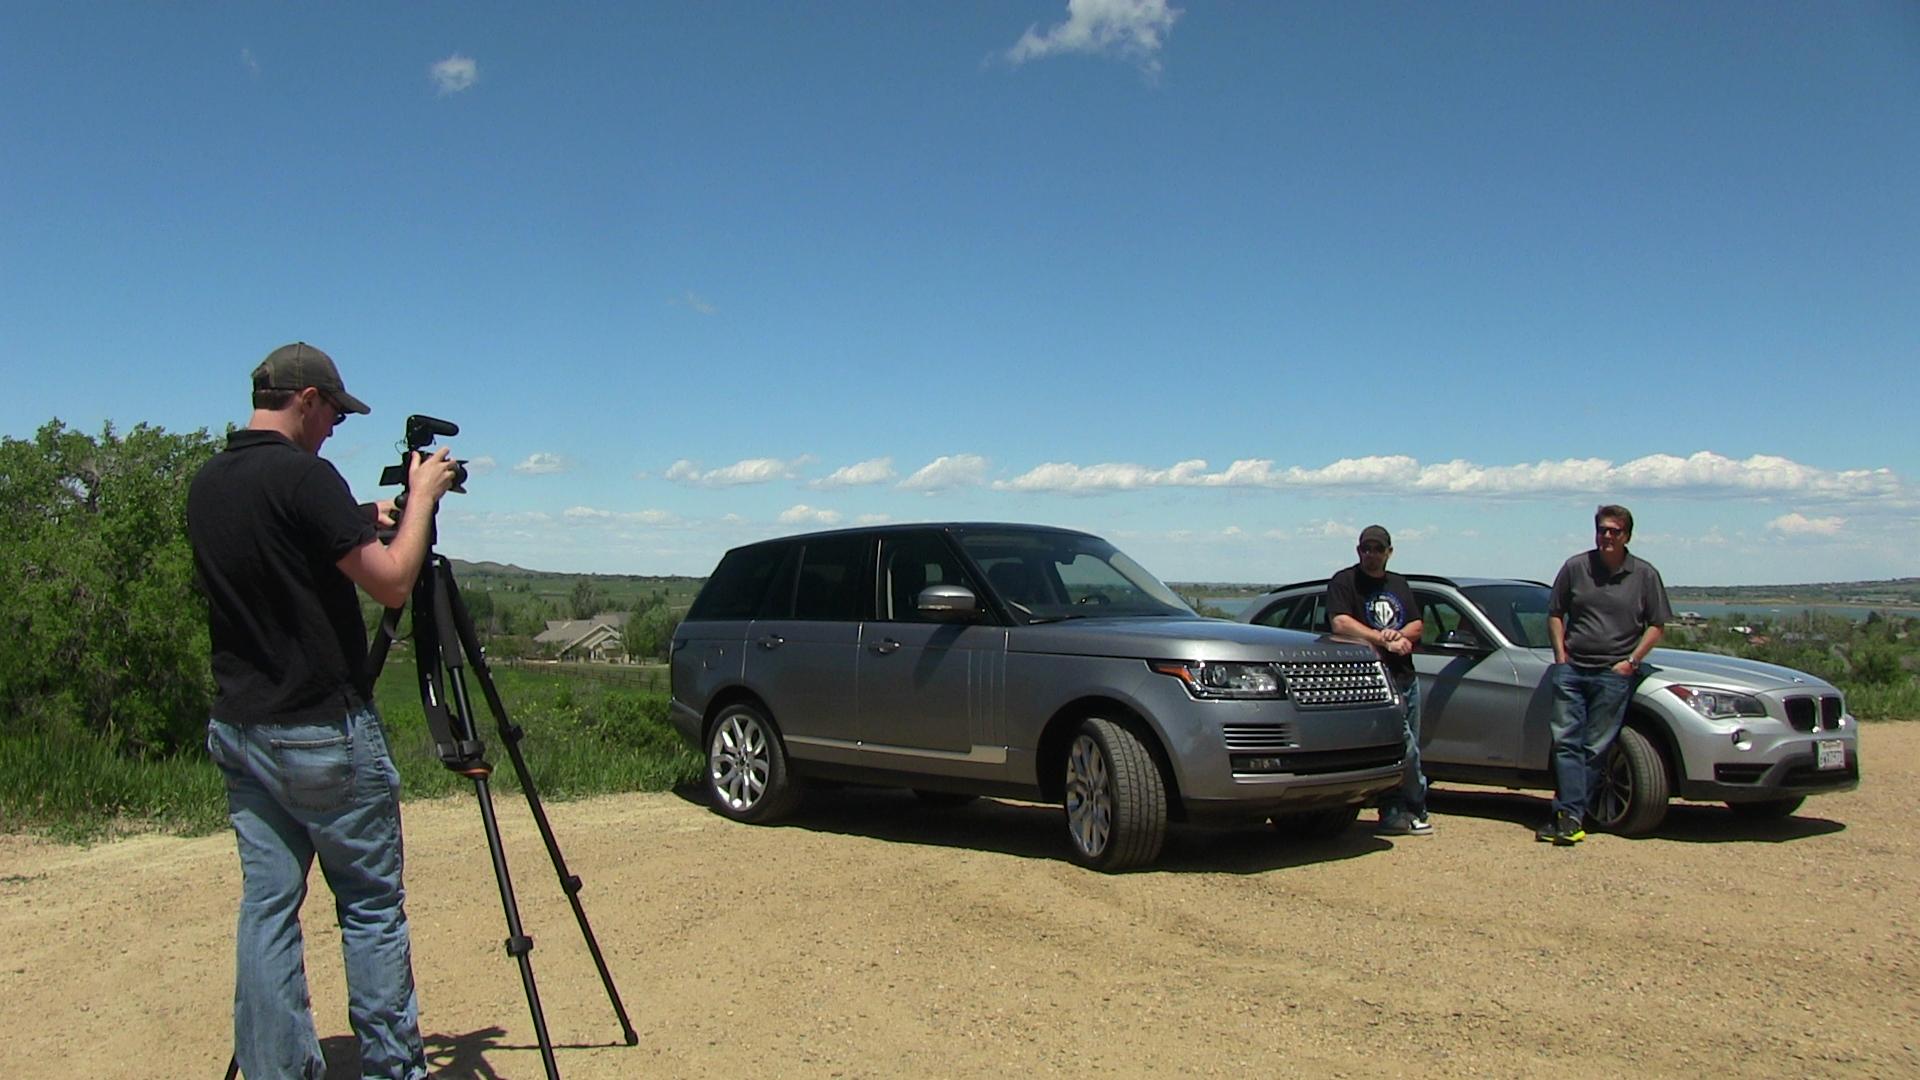 2013 Range Rover vs BMW X1 Mile High 0 60 MPH Mashup The Fast